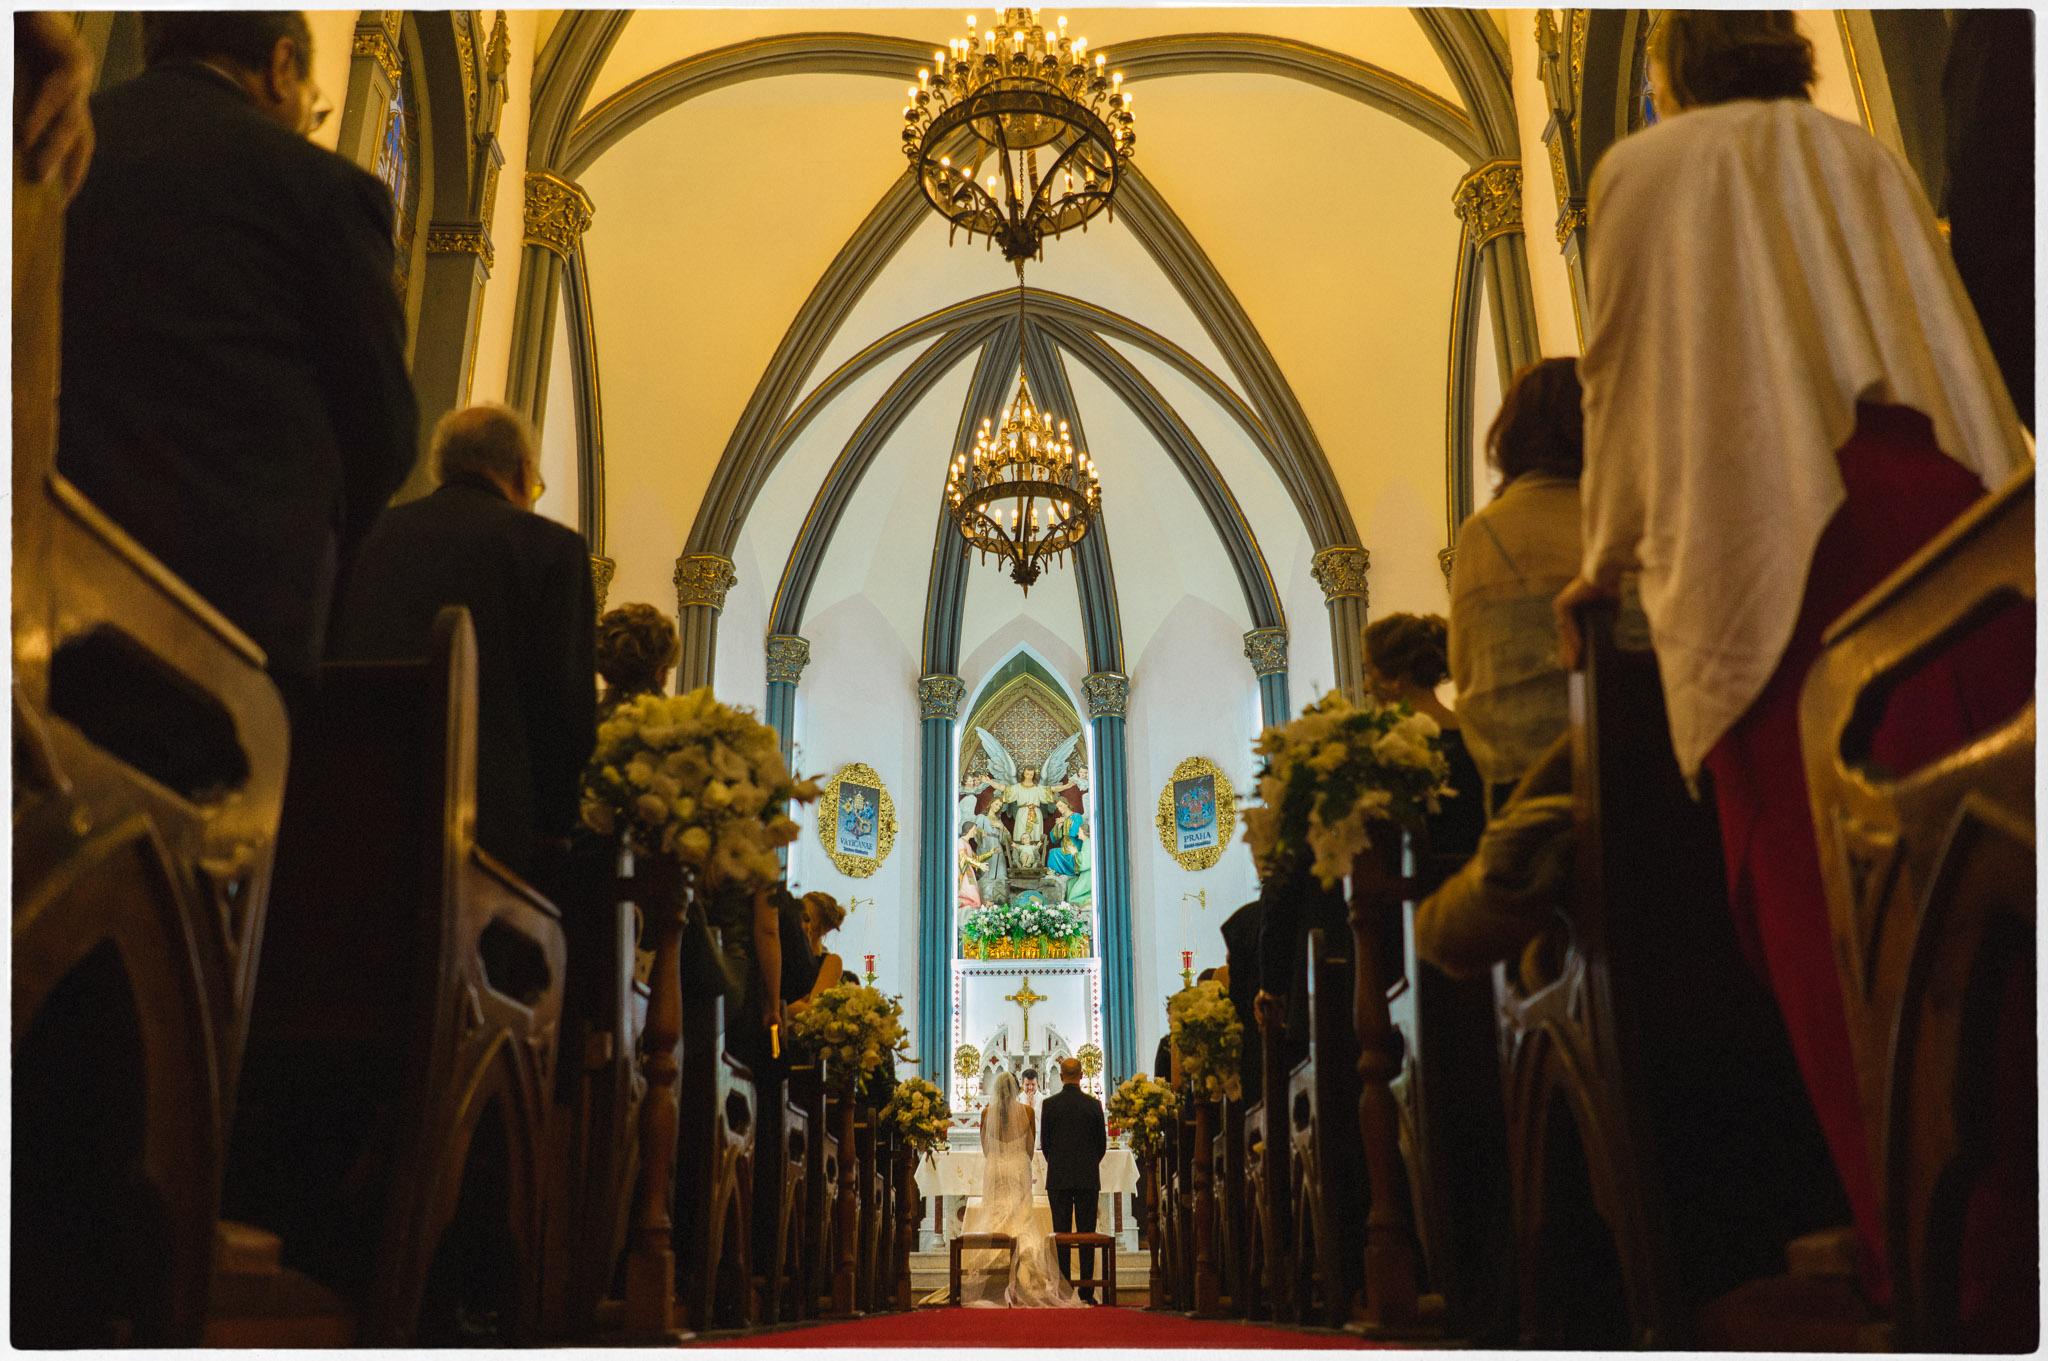 ©www.mauriziosolisbroca.com-20161001maurizio-solis-broca-mexico-canada-wedding-photographer20161001DSC05009-Edit.jpg